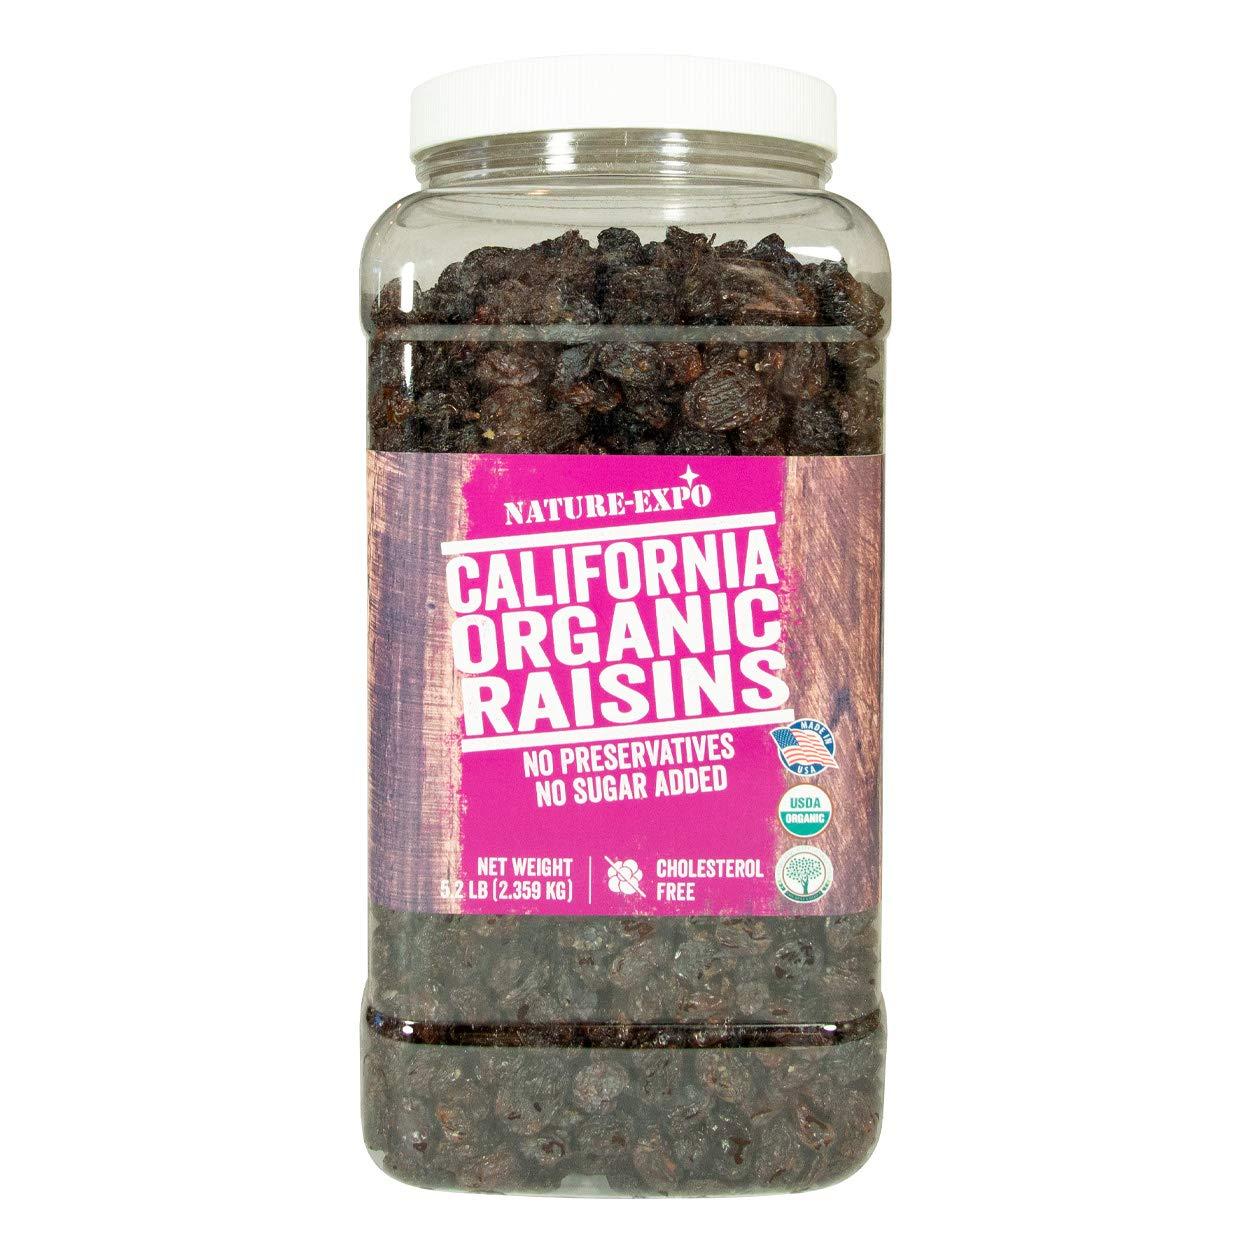 Nature-Expo California Organic Raisins - 5.2 lb Large PET Jar, Seasonally Fresh, Seedless, No Added Sugars or Preservatives, Non-GMO